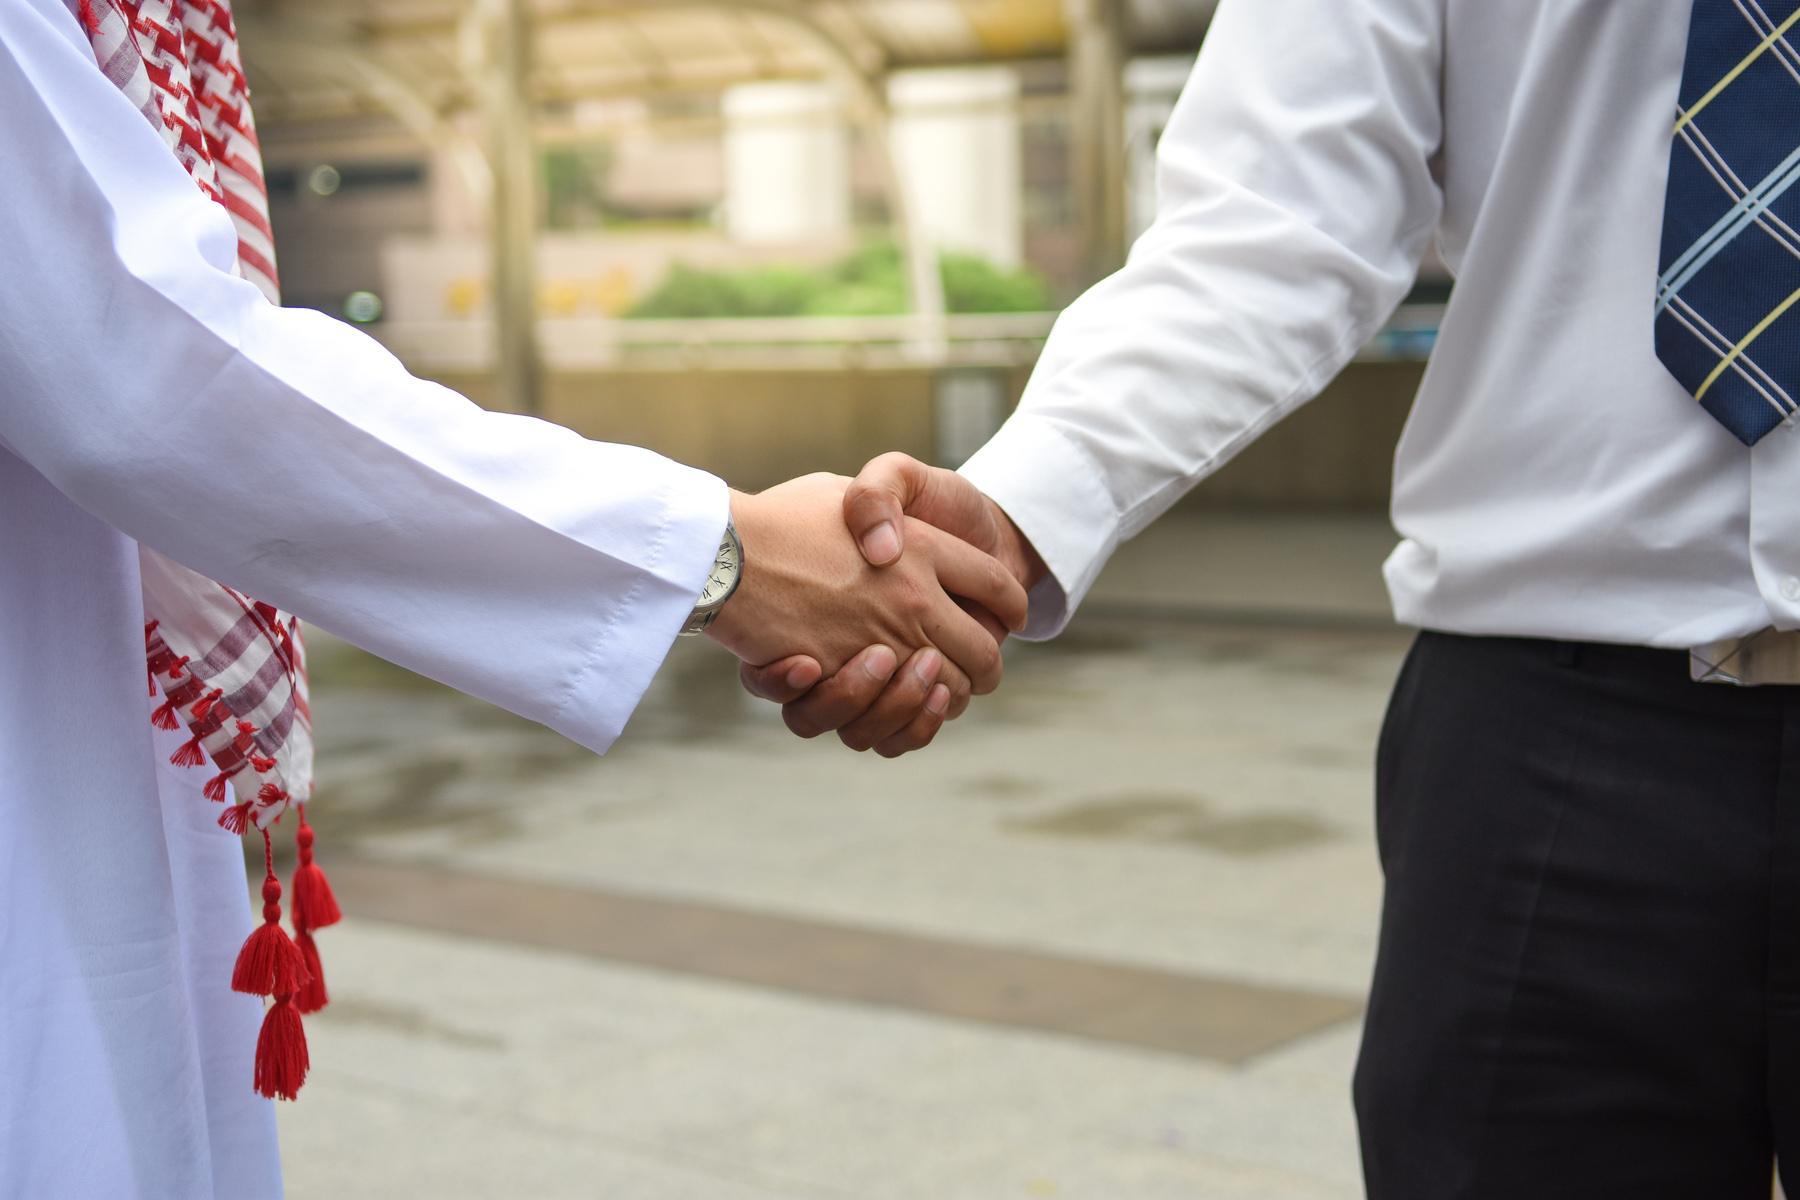 Handshake with a Saudi businessman